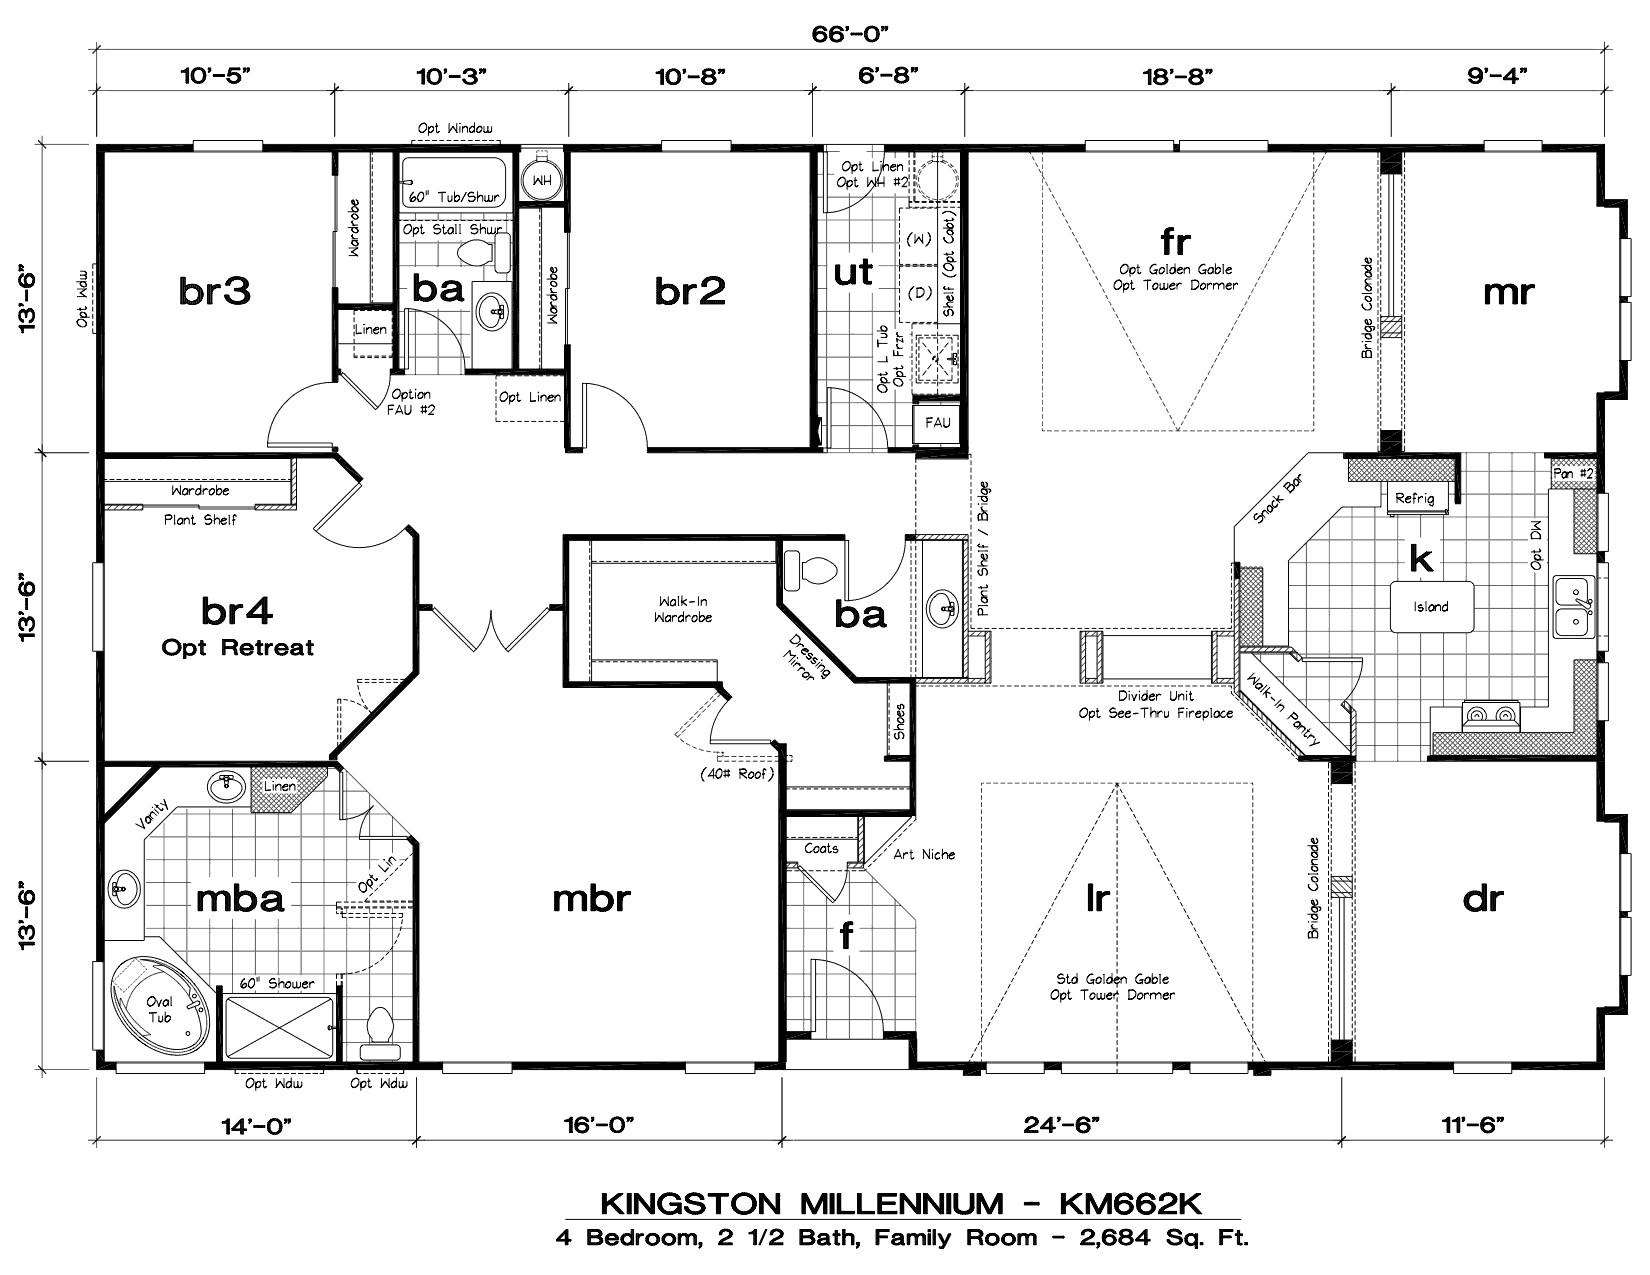 free modular home floor plans fresh 28 mobile home designs floor plans 25 best ideas about